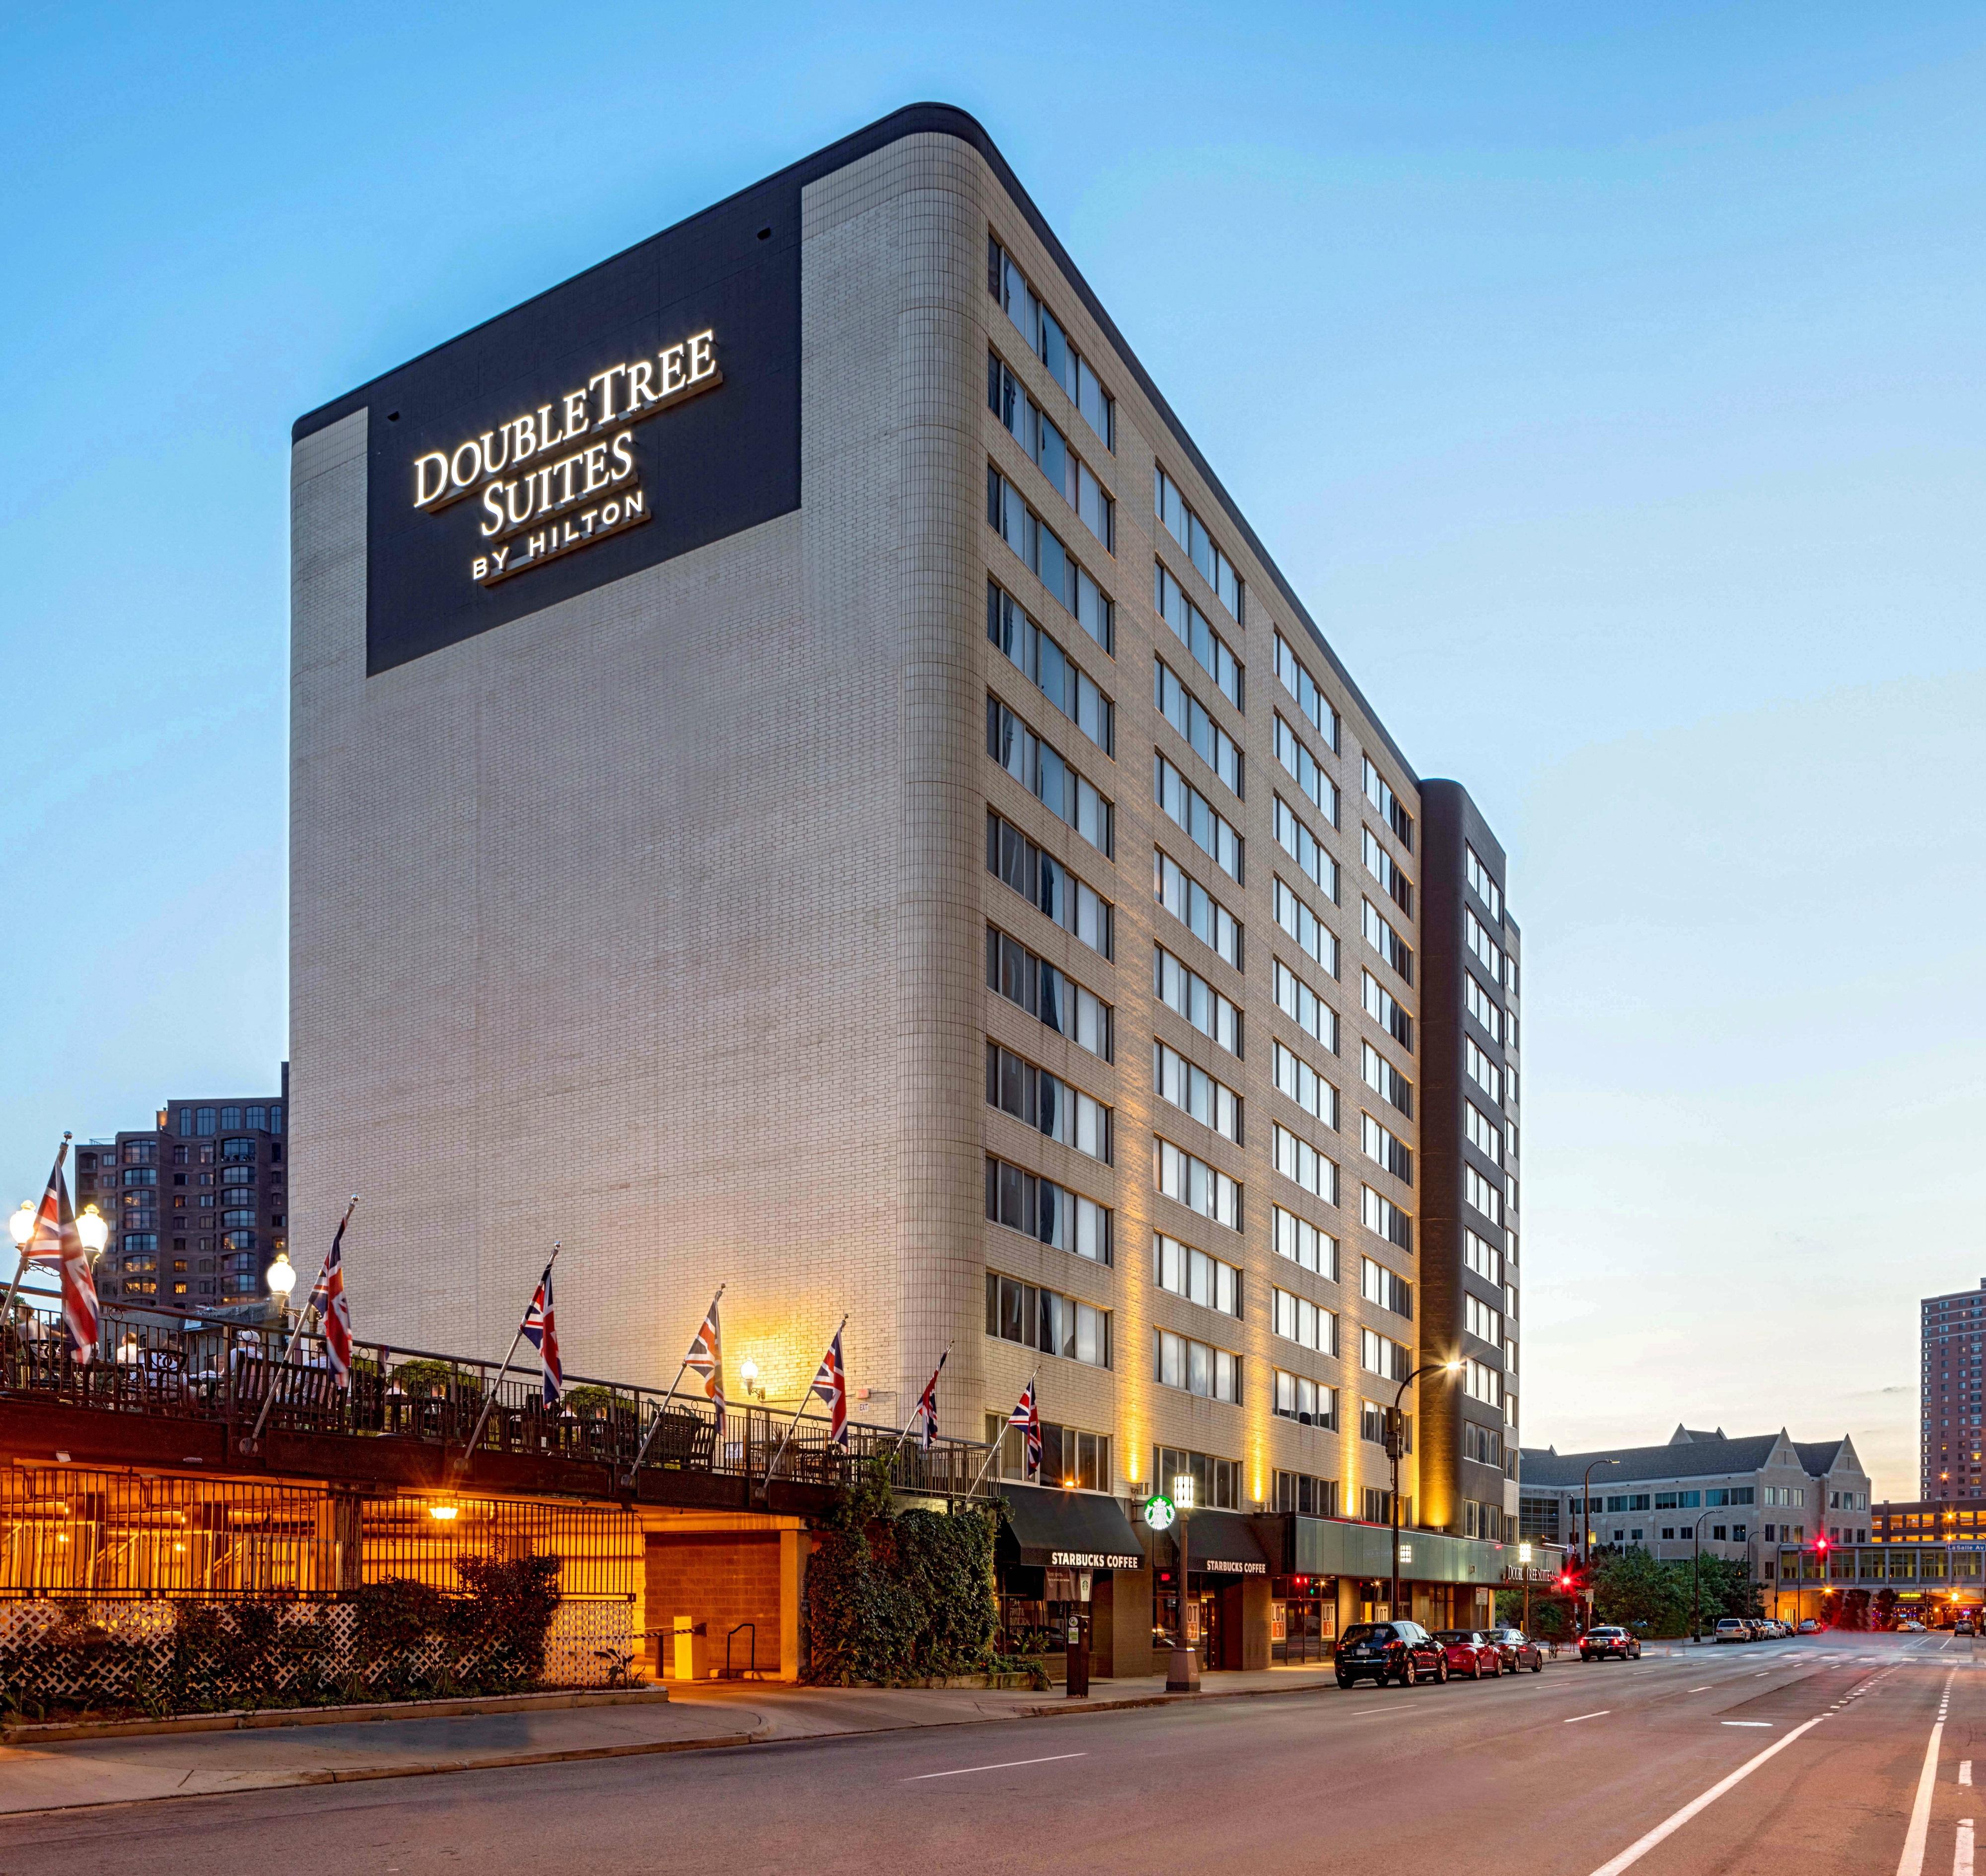 A Doubletree By Hilton Hotel In: DoubleTree Suites By Hilton Hotel Minneapolis, Minneapolis